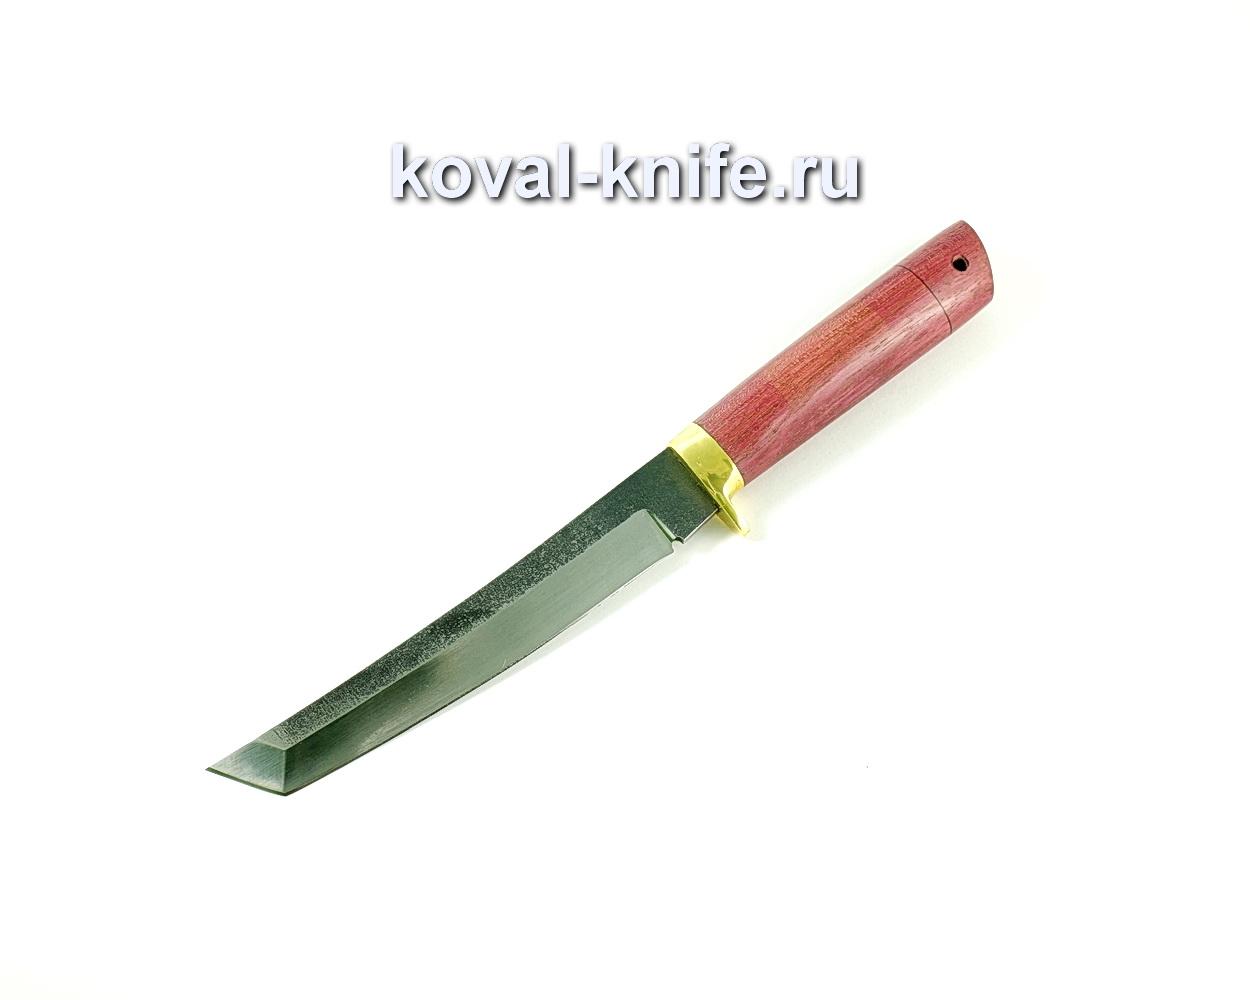 Нож Танто (сталь 110х18), рукоять амарант, литье A227